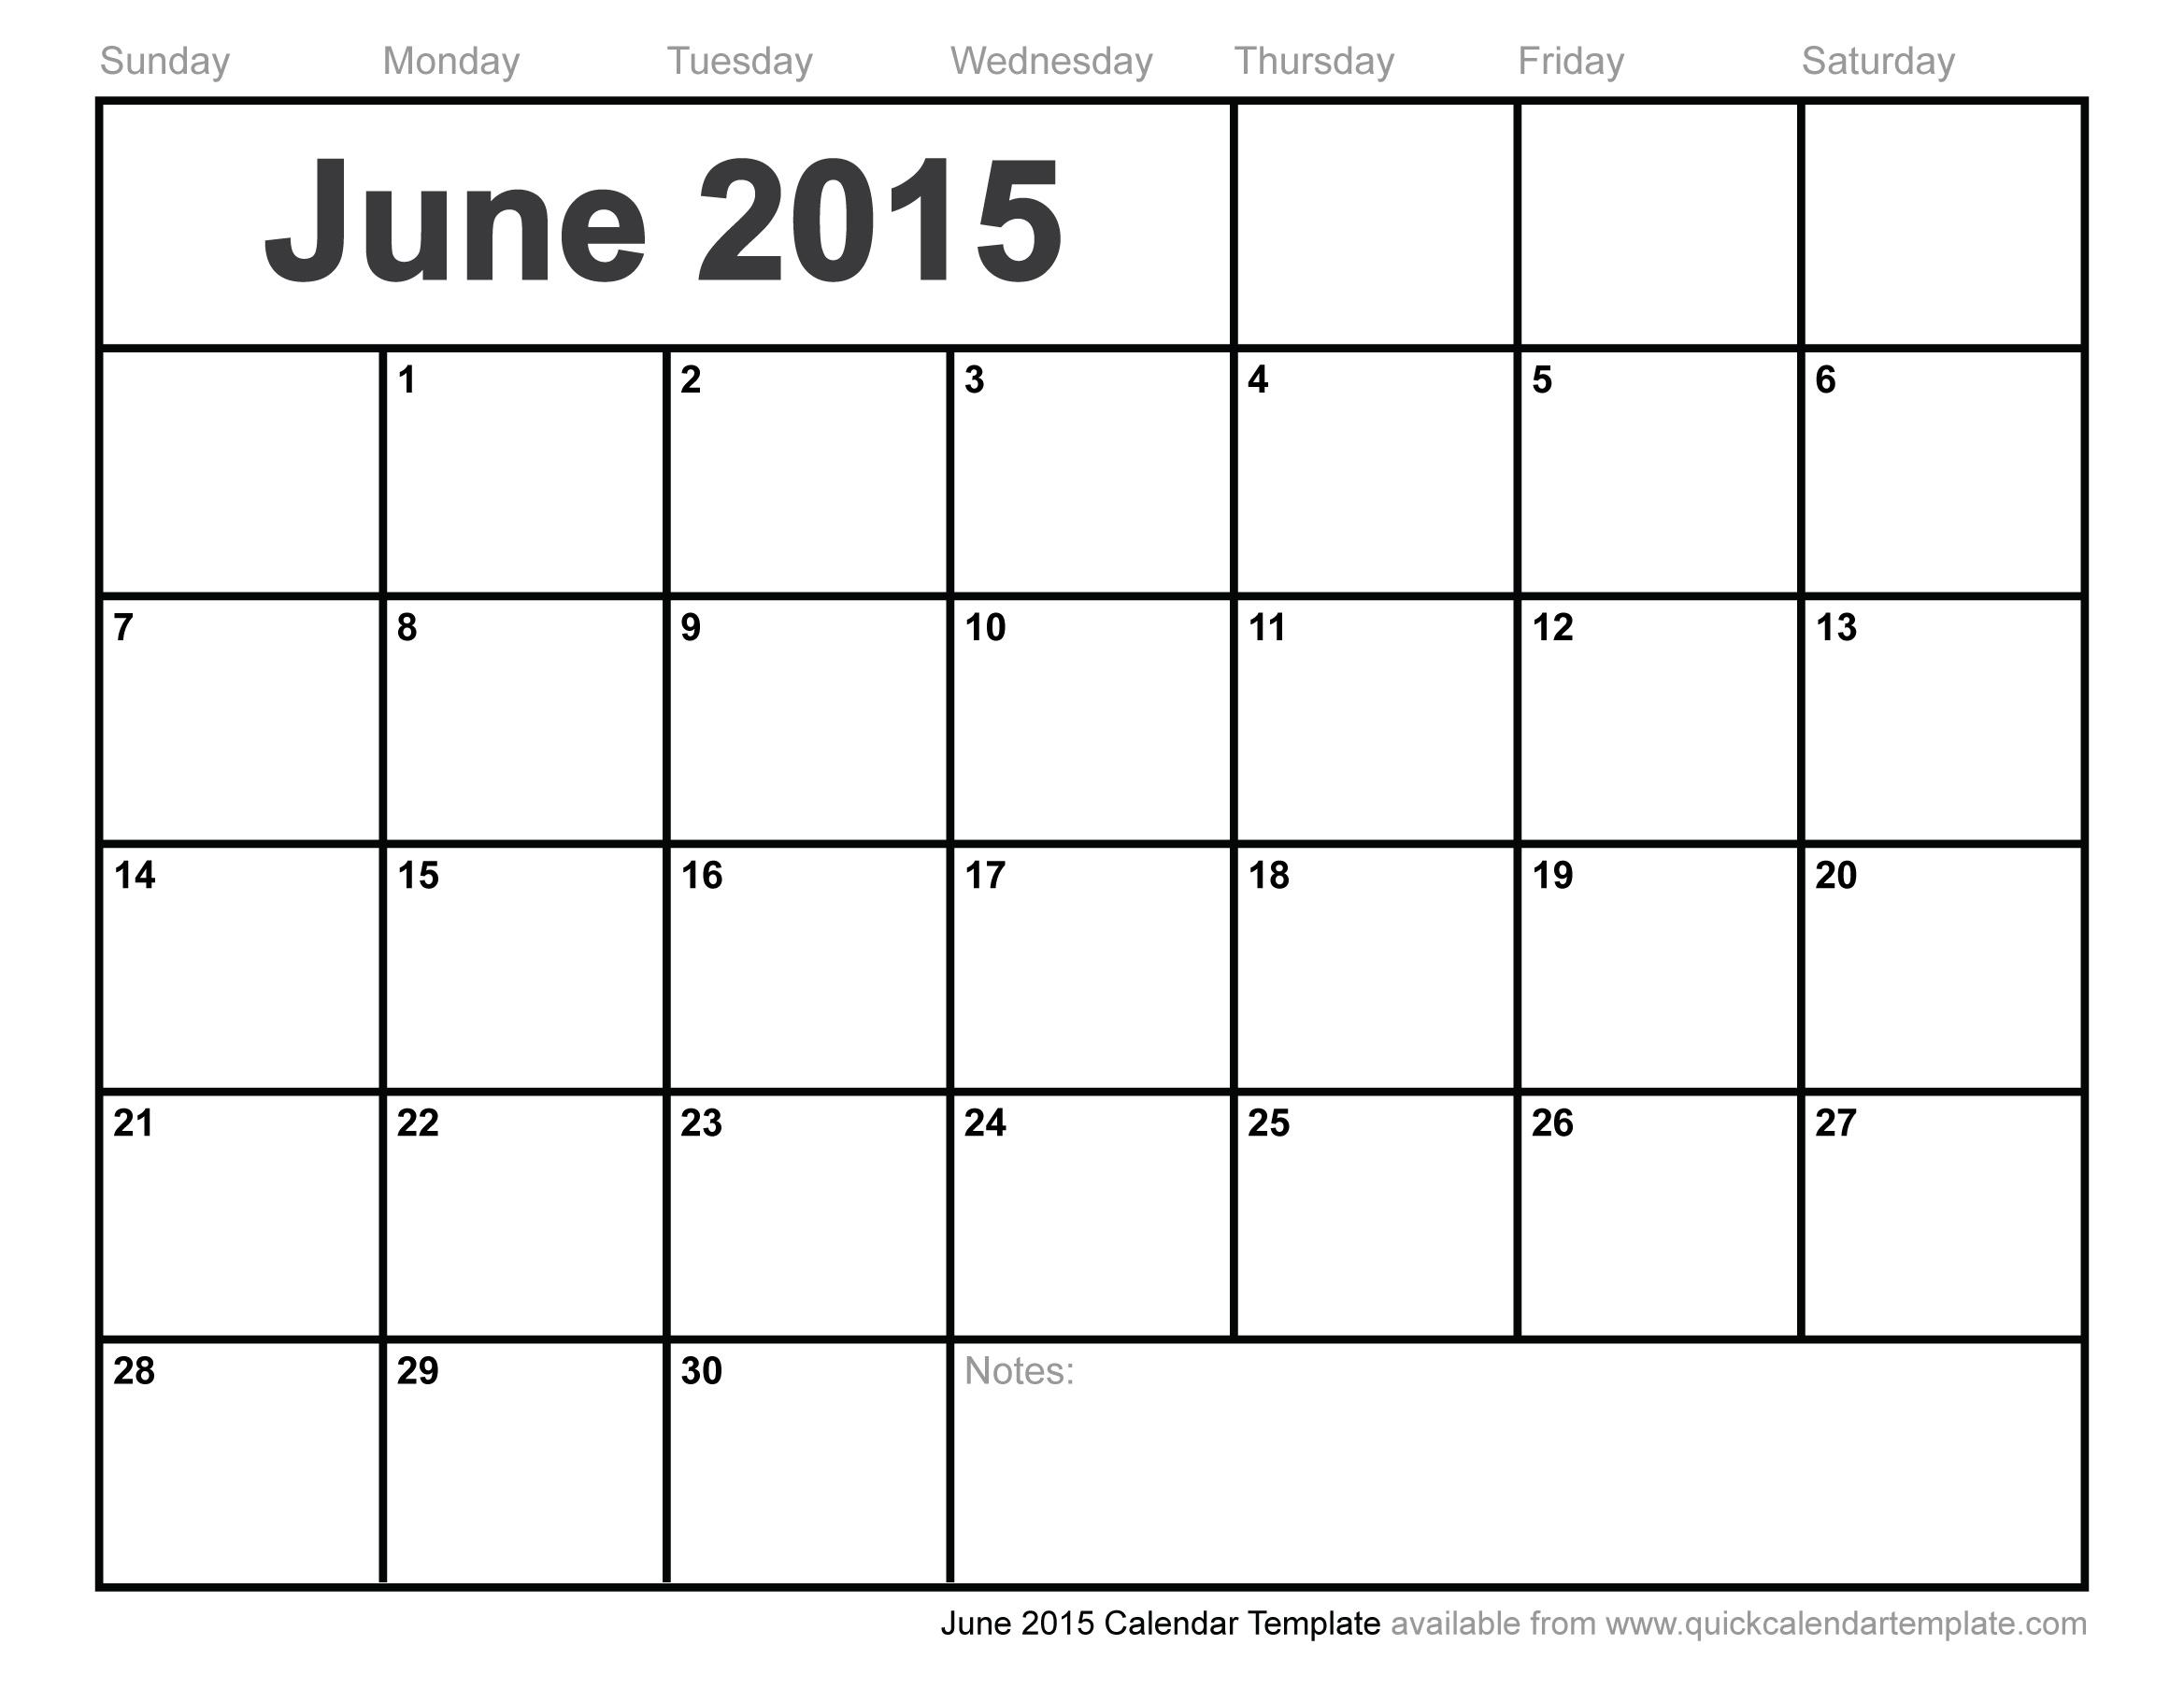 August 2015 calendar clipart svg library stock Blank june calendar clipart - ClipartFest svg library stock